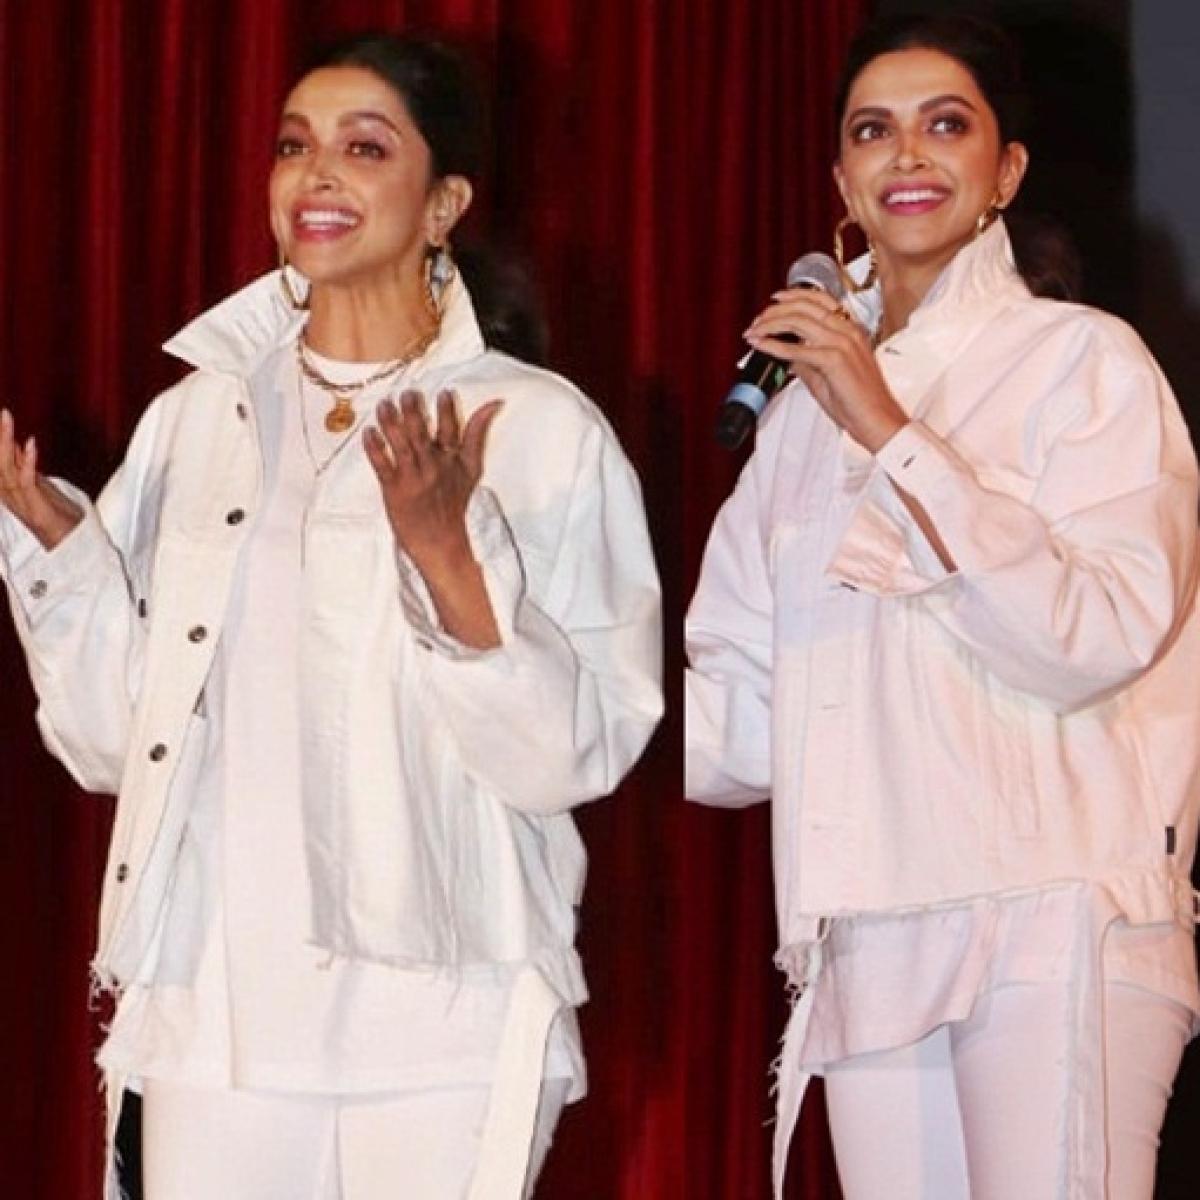 Deepika Padukone stuns in an all-white ensemble at IIT Bombay's festival Mood Indigo